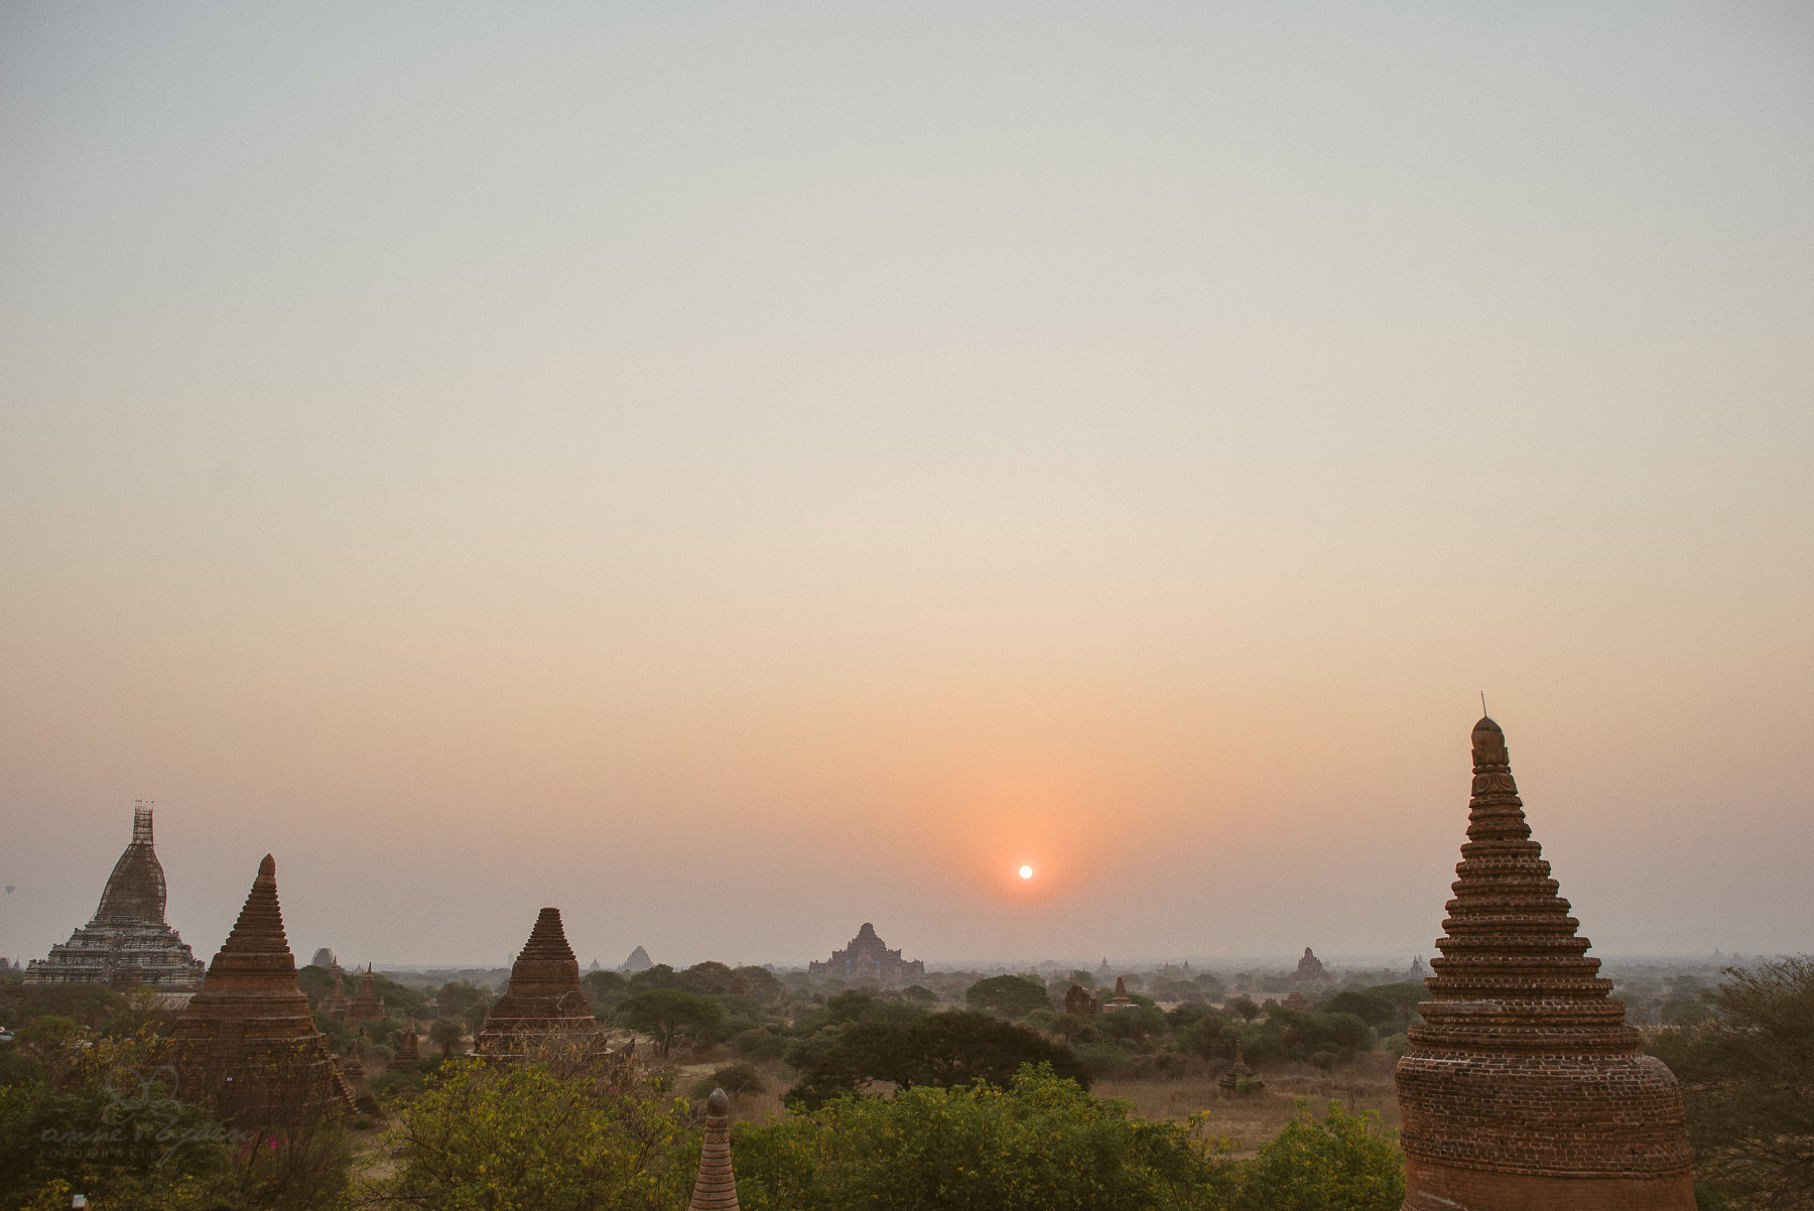 0003 bagan ngwesaung d75 1258 1 - Tempelstadt Bagan & tauchen am Ngwesaungbeach